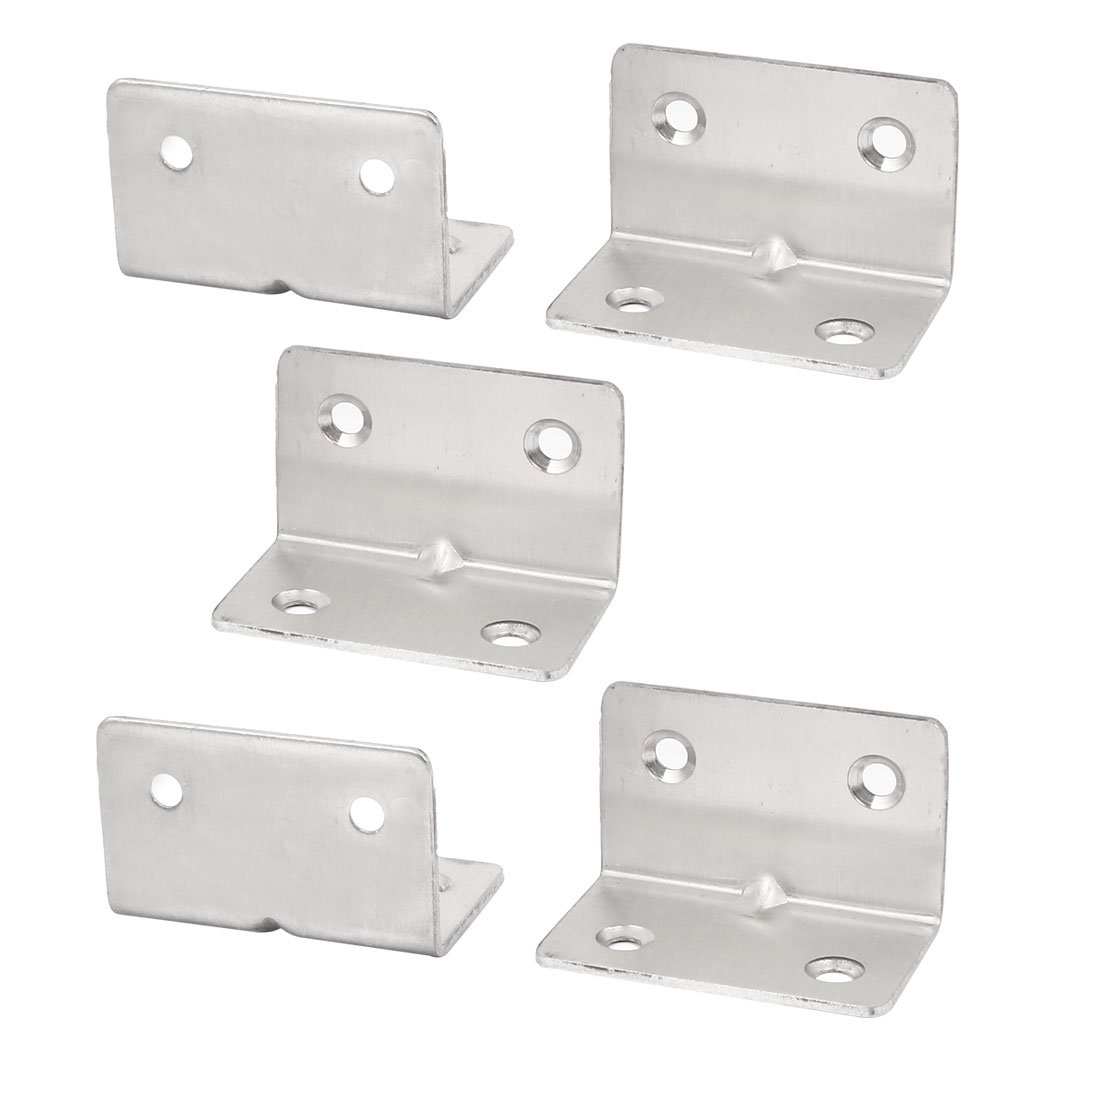 Online Get Cheap Corner Braces for Shelves -Aliexpress.com ...